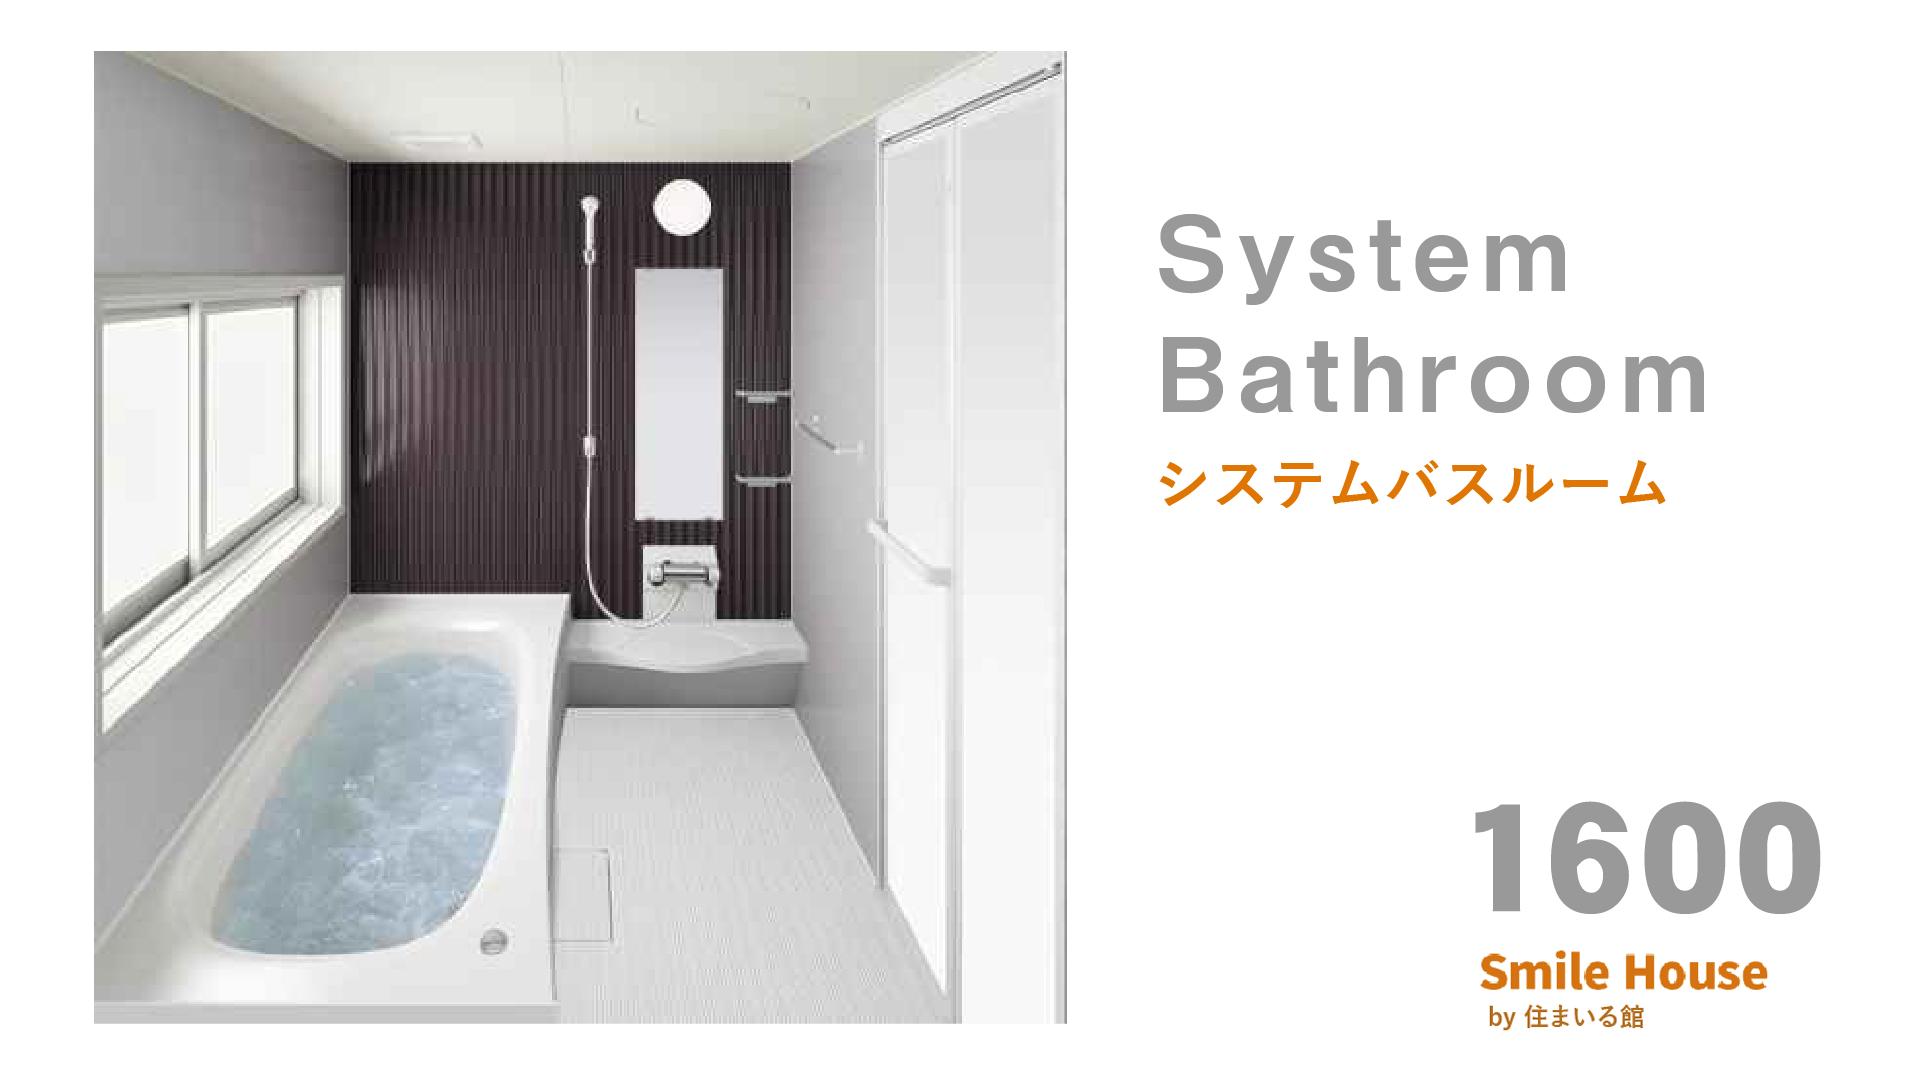 Systembathroom1600